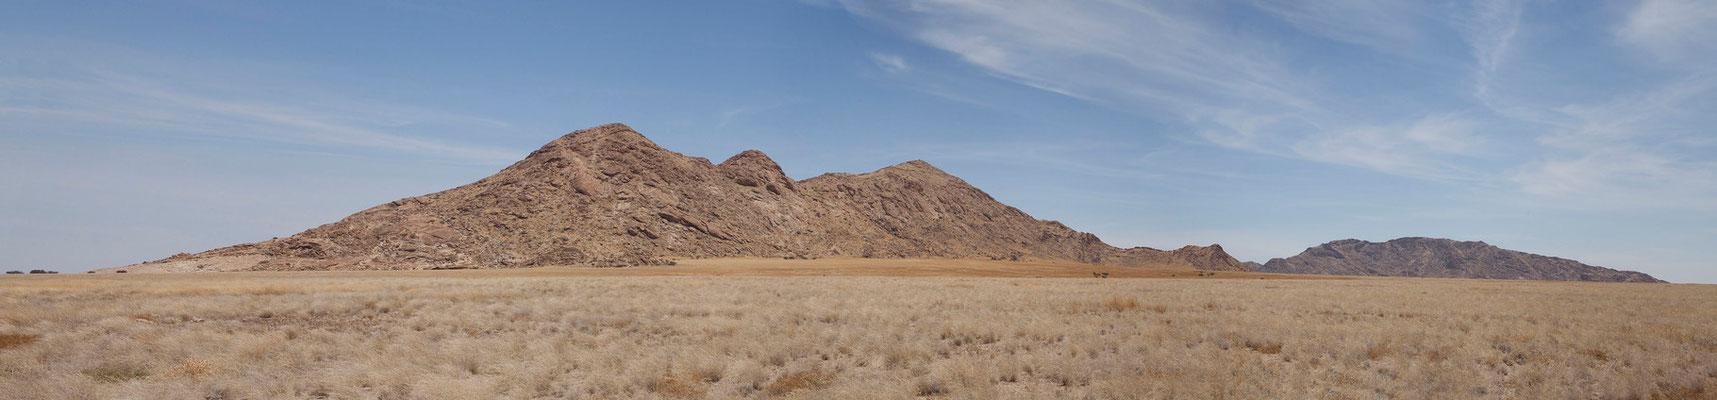 19.2. Unser heutiger Weg führt uns in den Namib-Naukluft Park